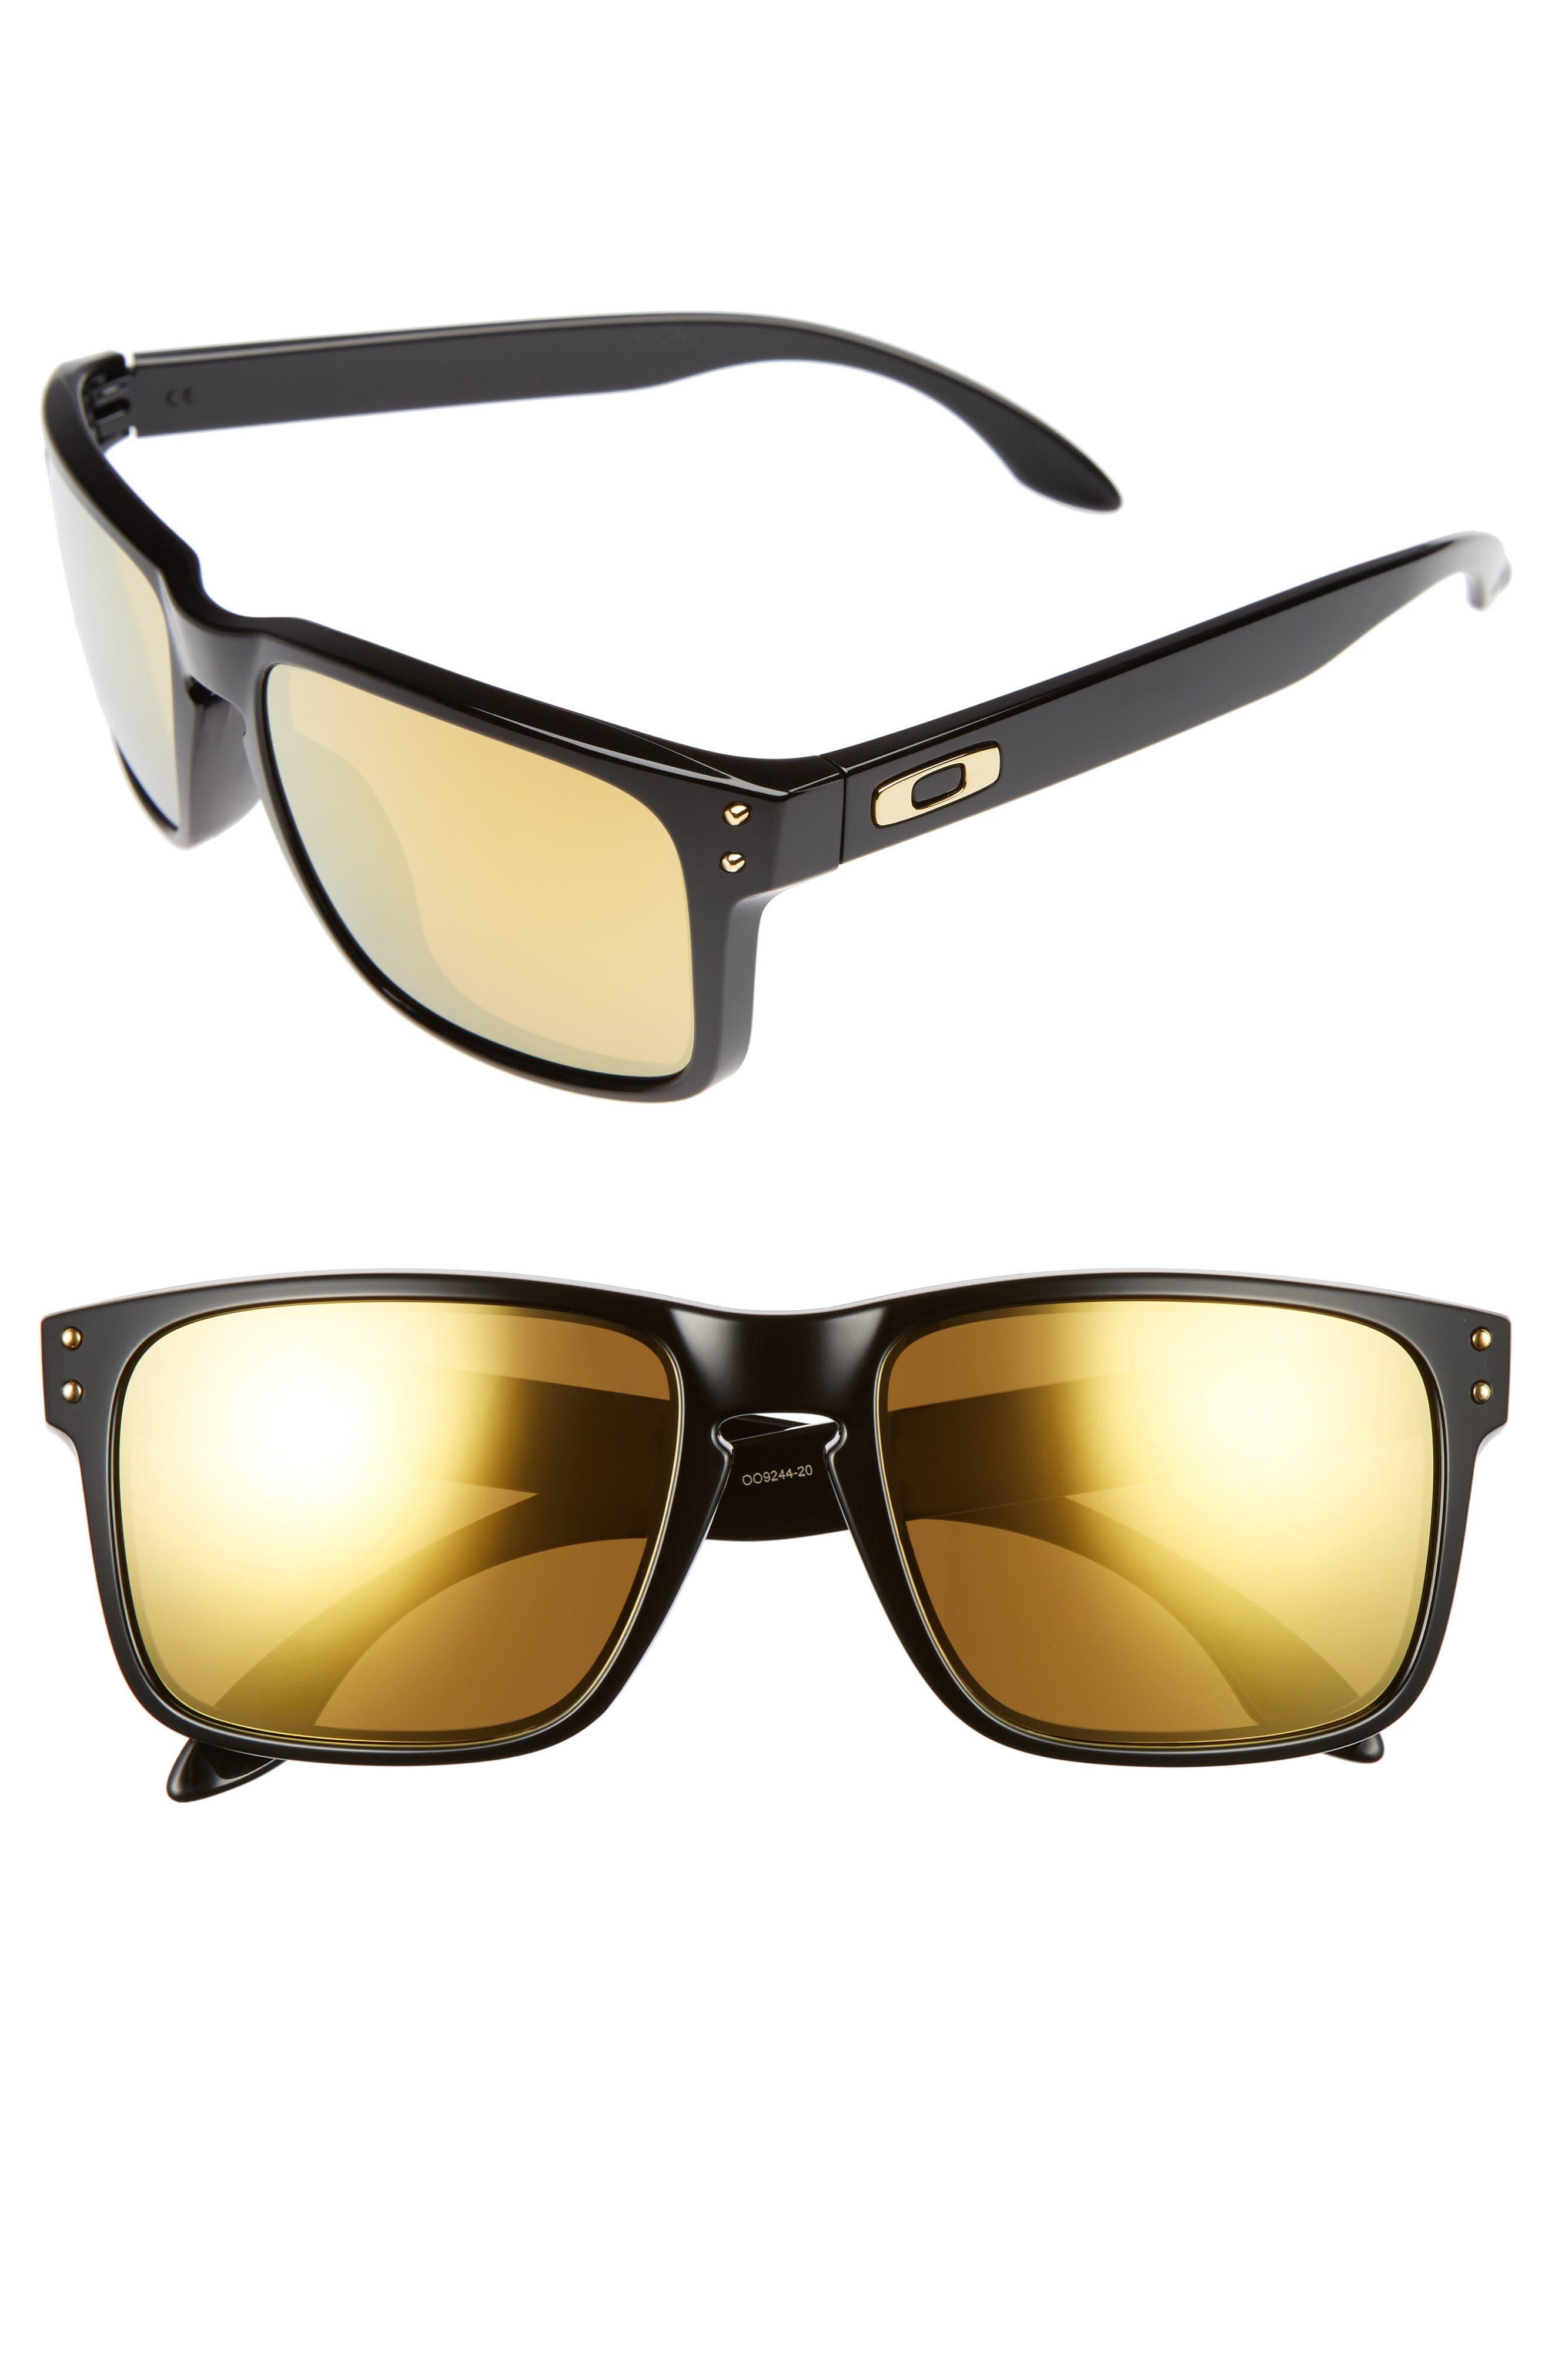 Oakley Holbrook 56mm Polarized Sunglasses